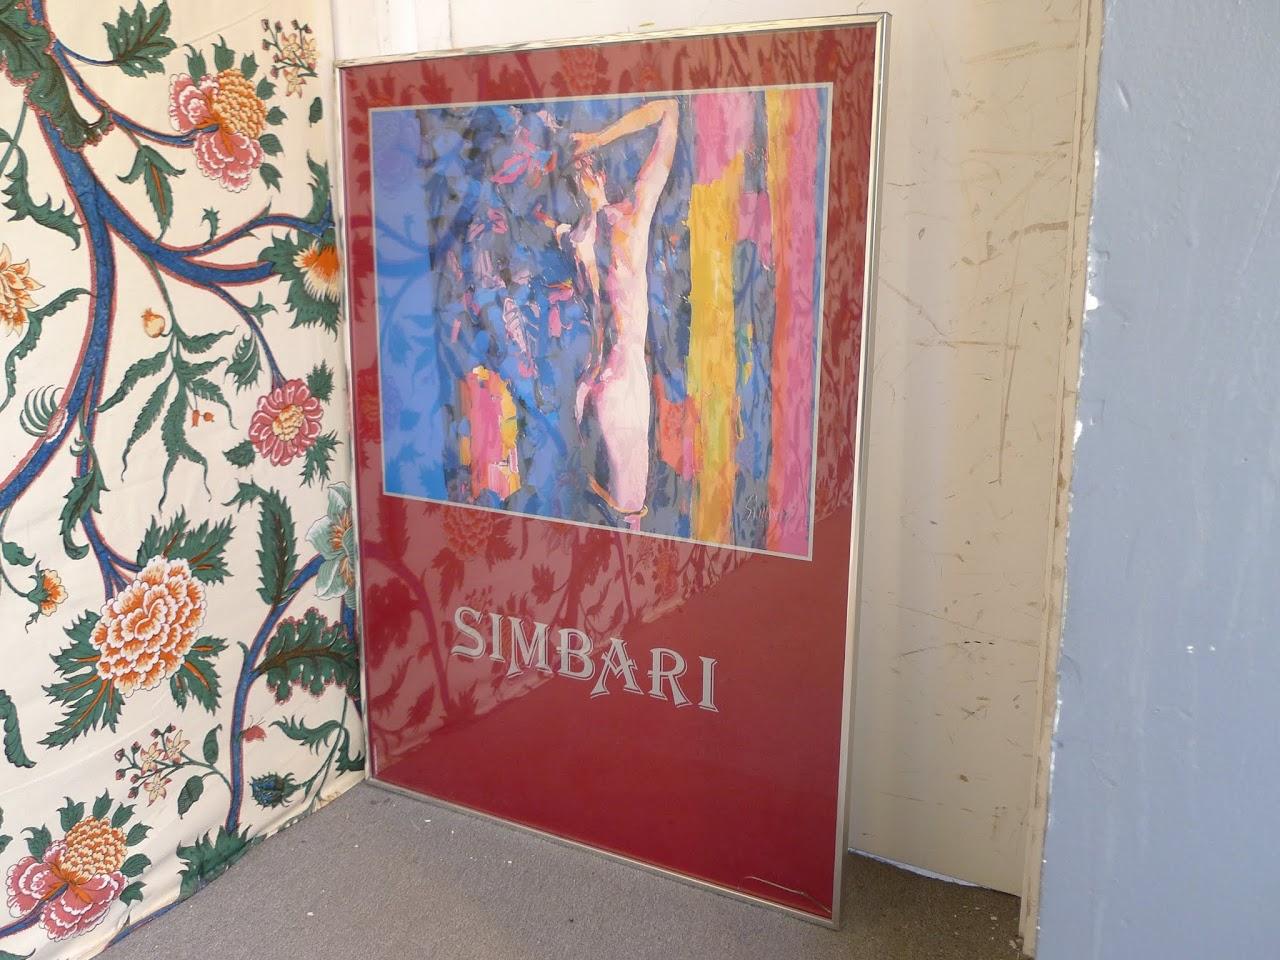 Nicola Simbari Signed Poster